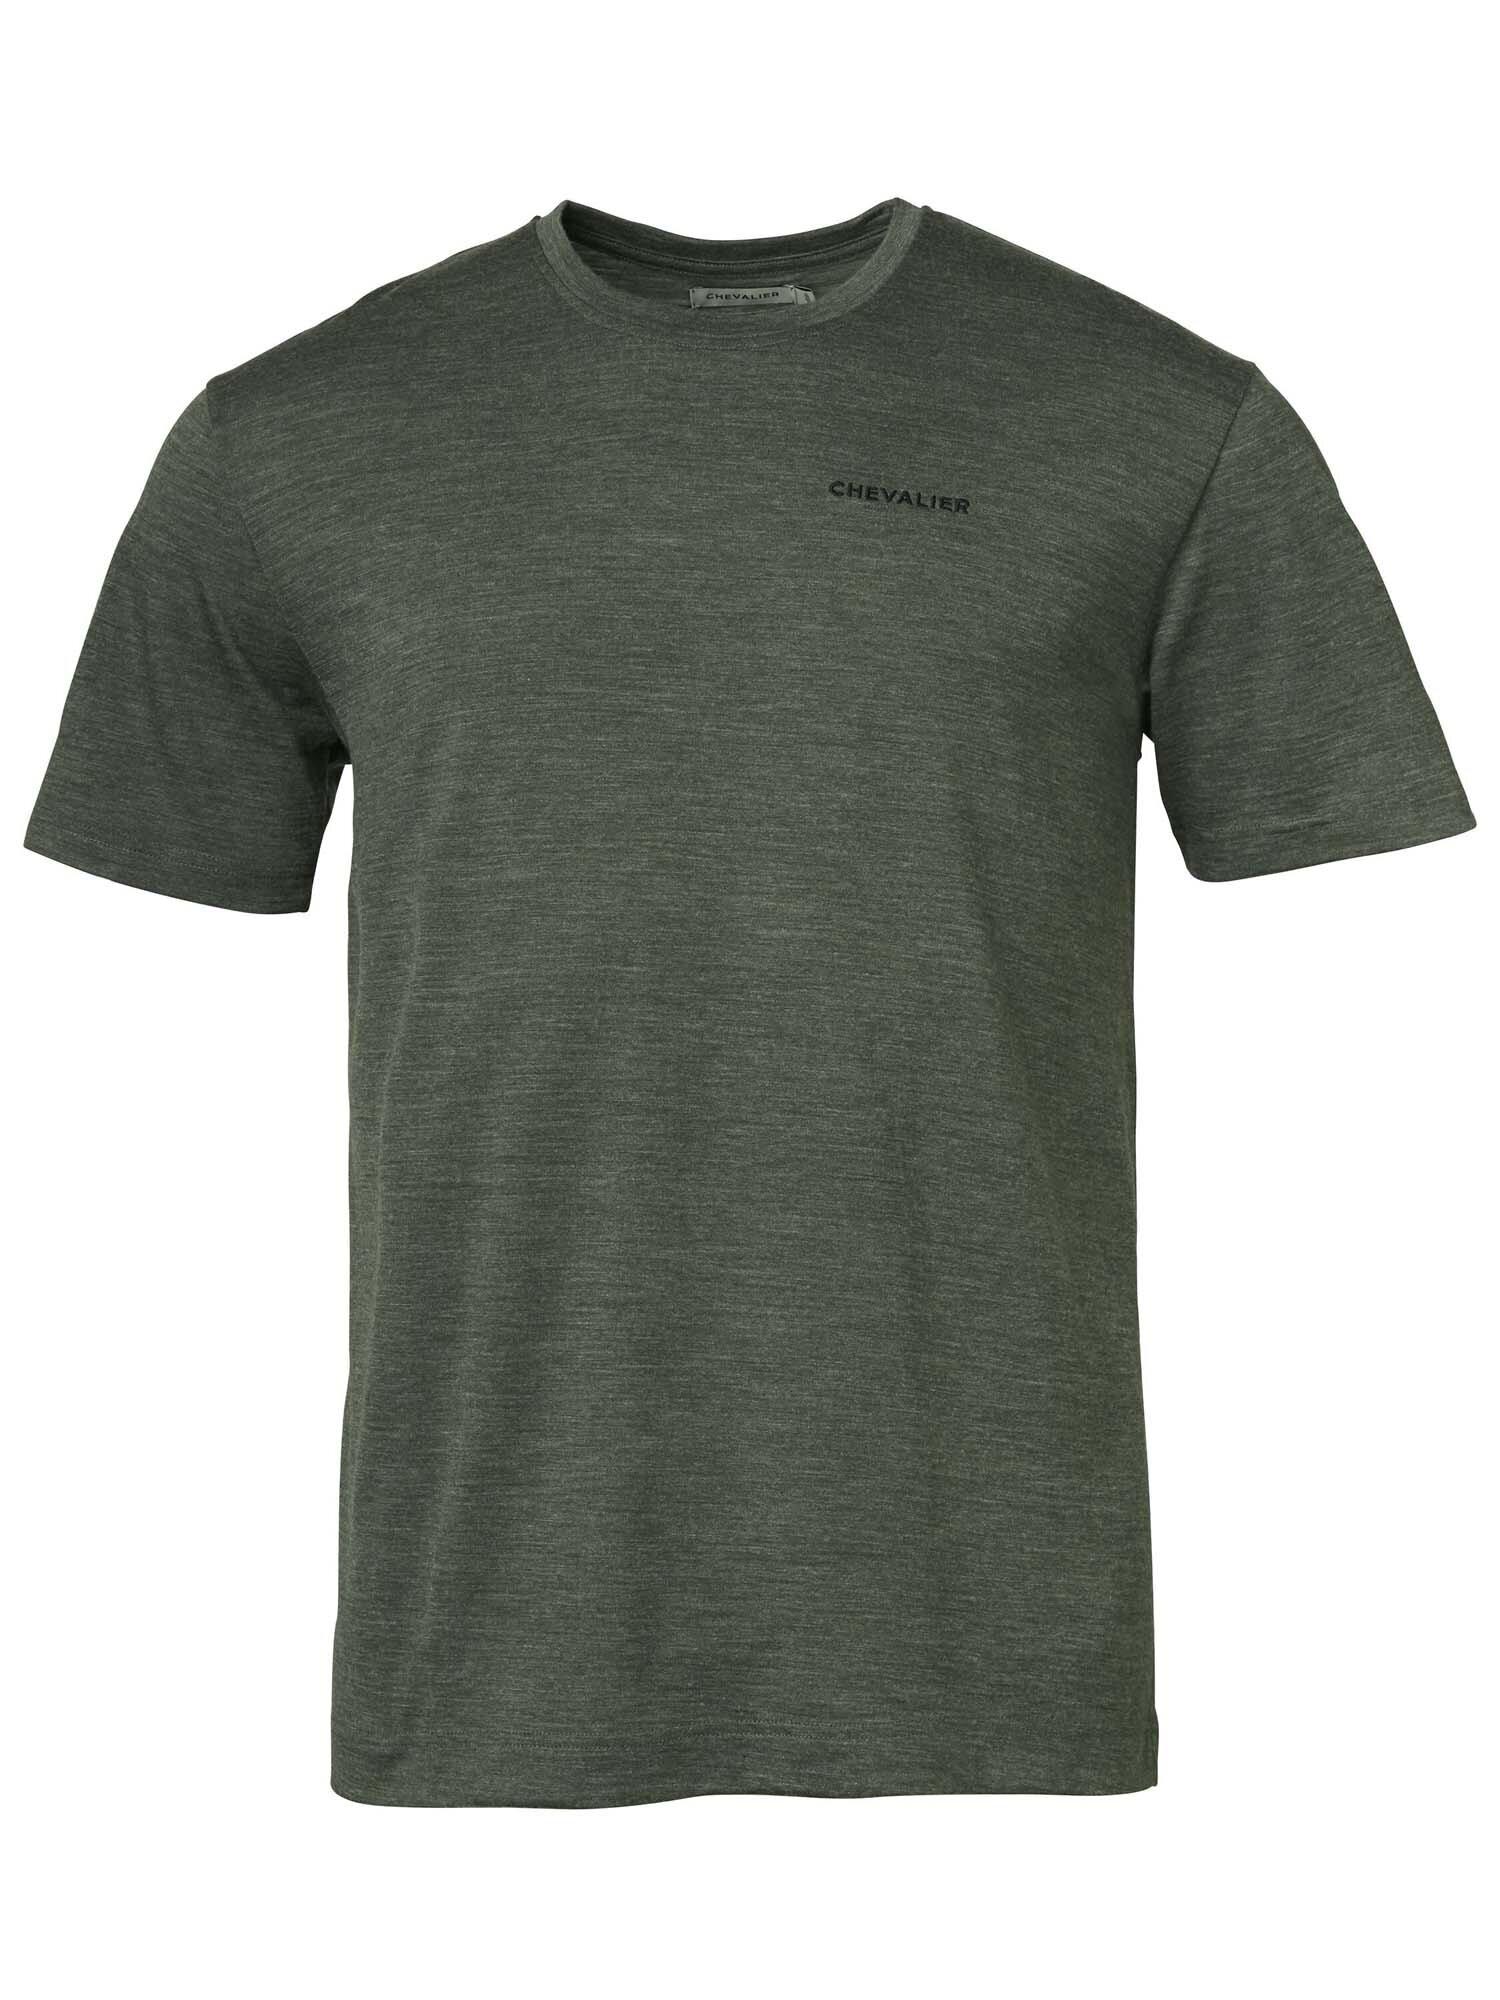 Coley T-shirt Herr